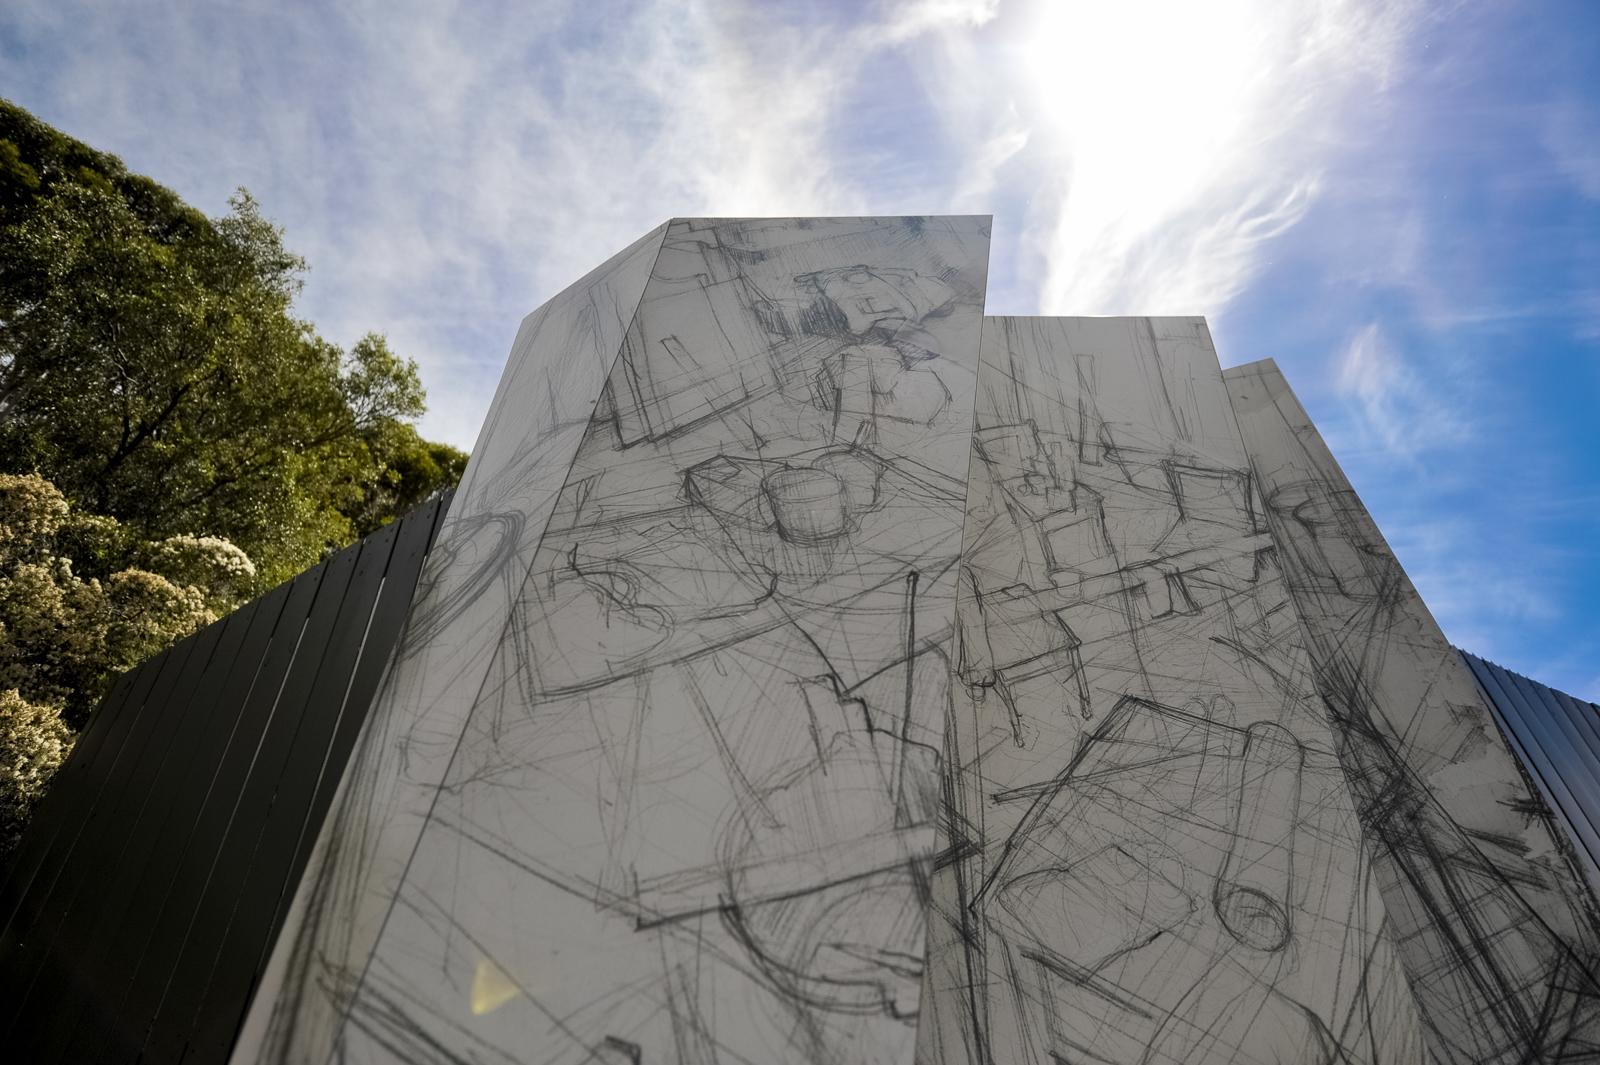 Ascot Park Public Artwork 3